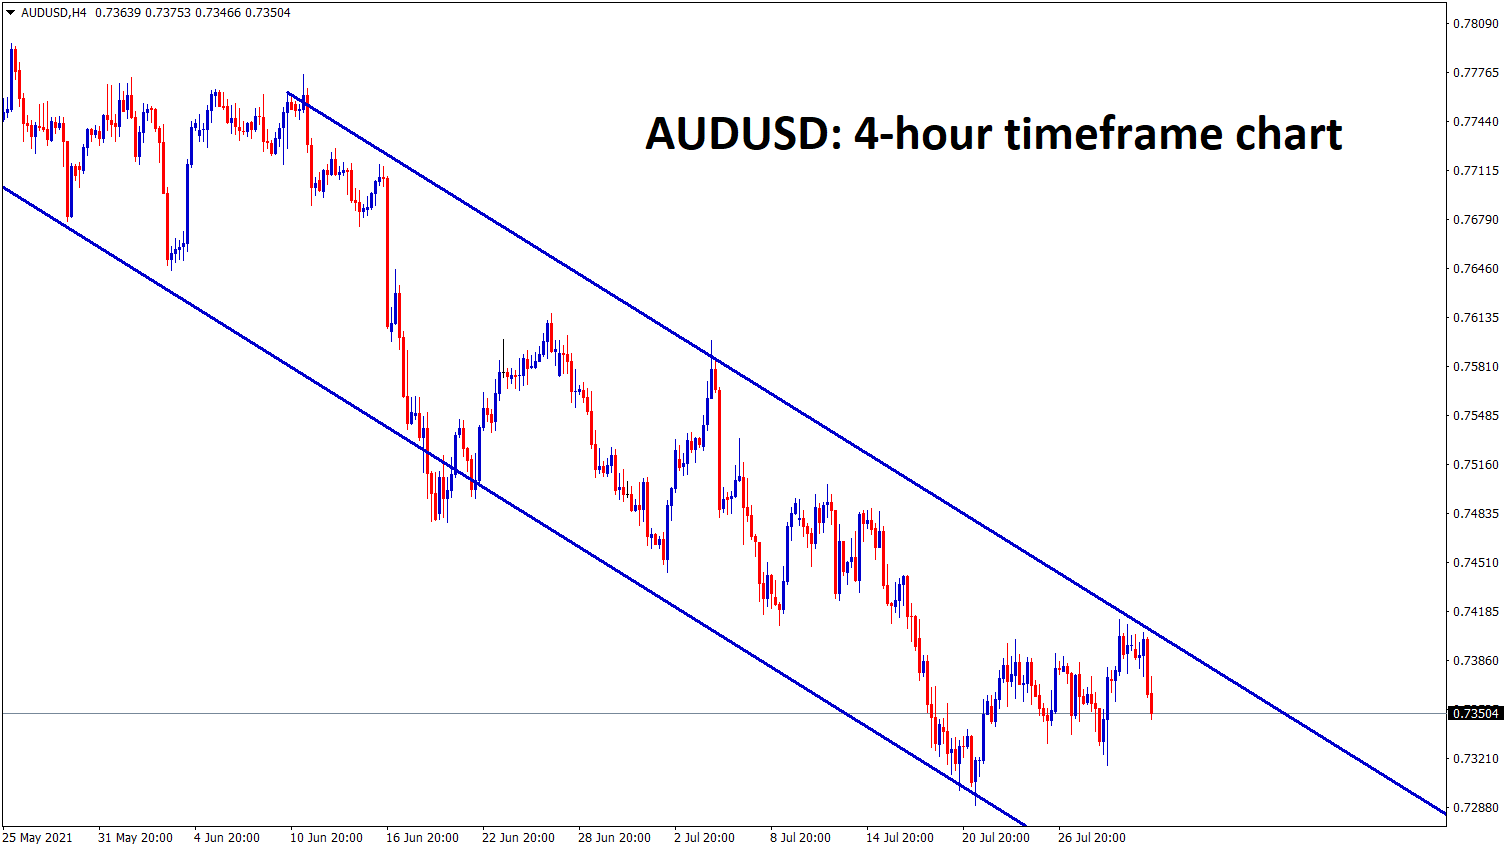 AUDUSD moving in descending channel range in the 4hr timeframe